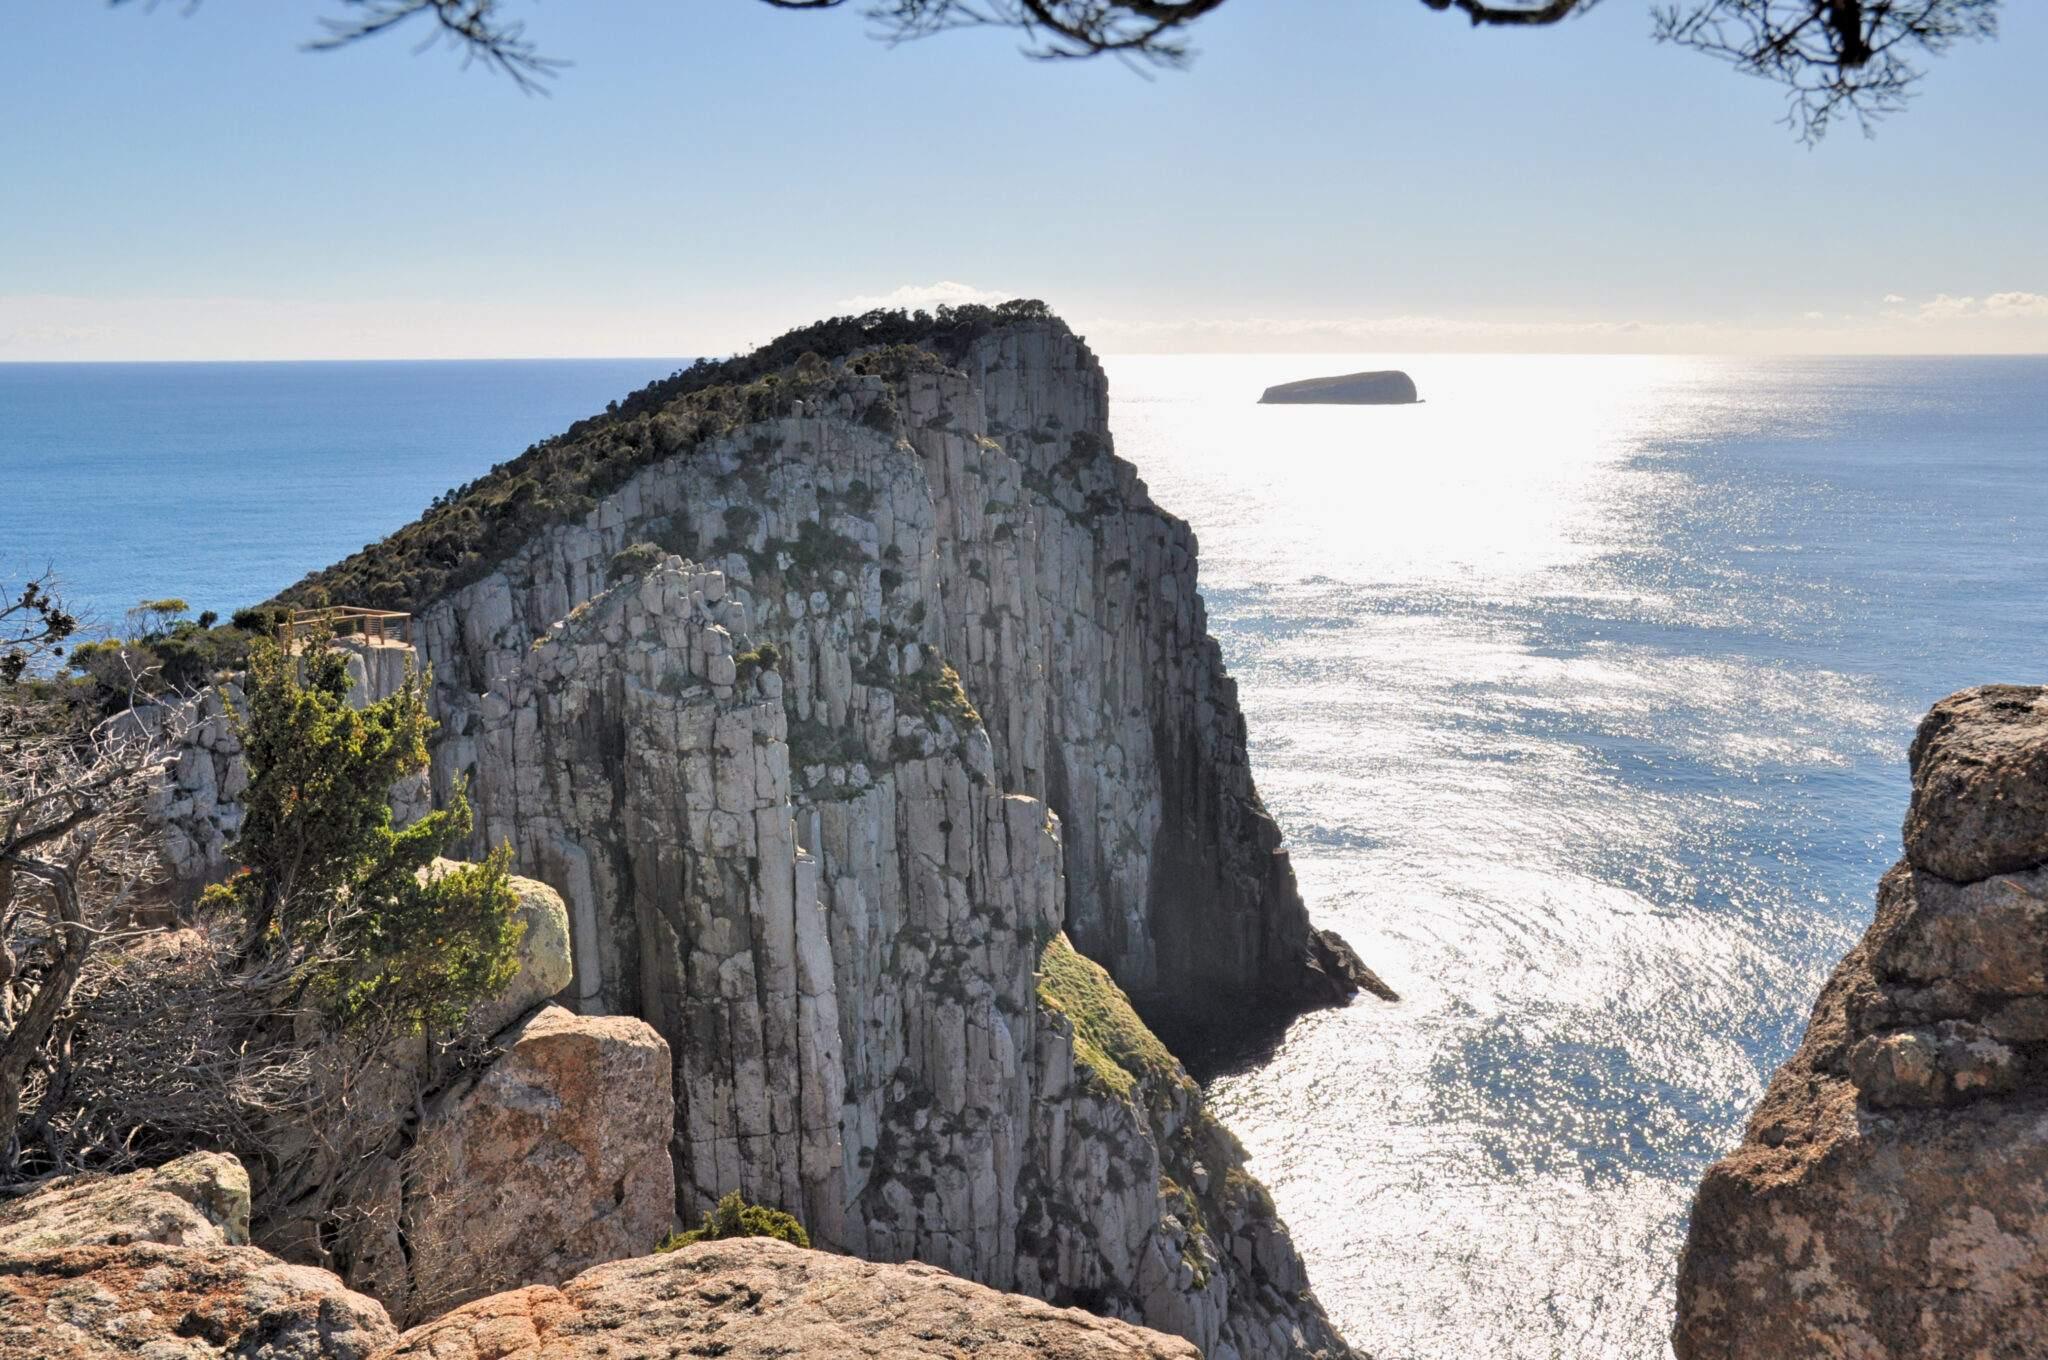 mooiste wandelingen in tasmanie cape hauy tasman peninsula